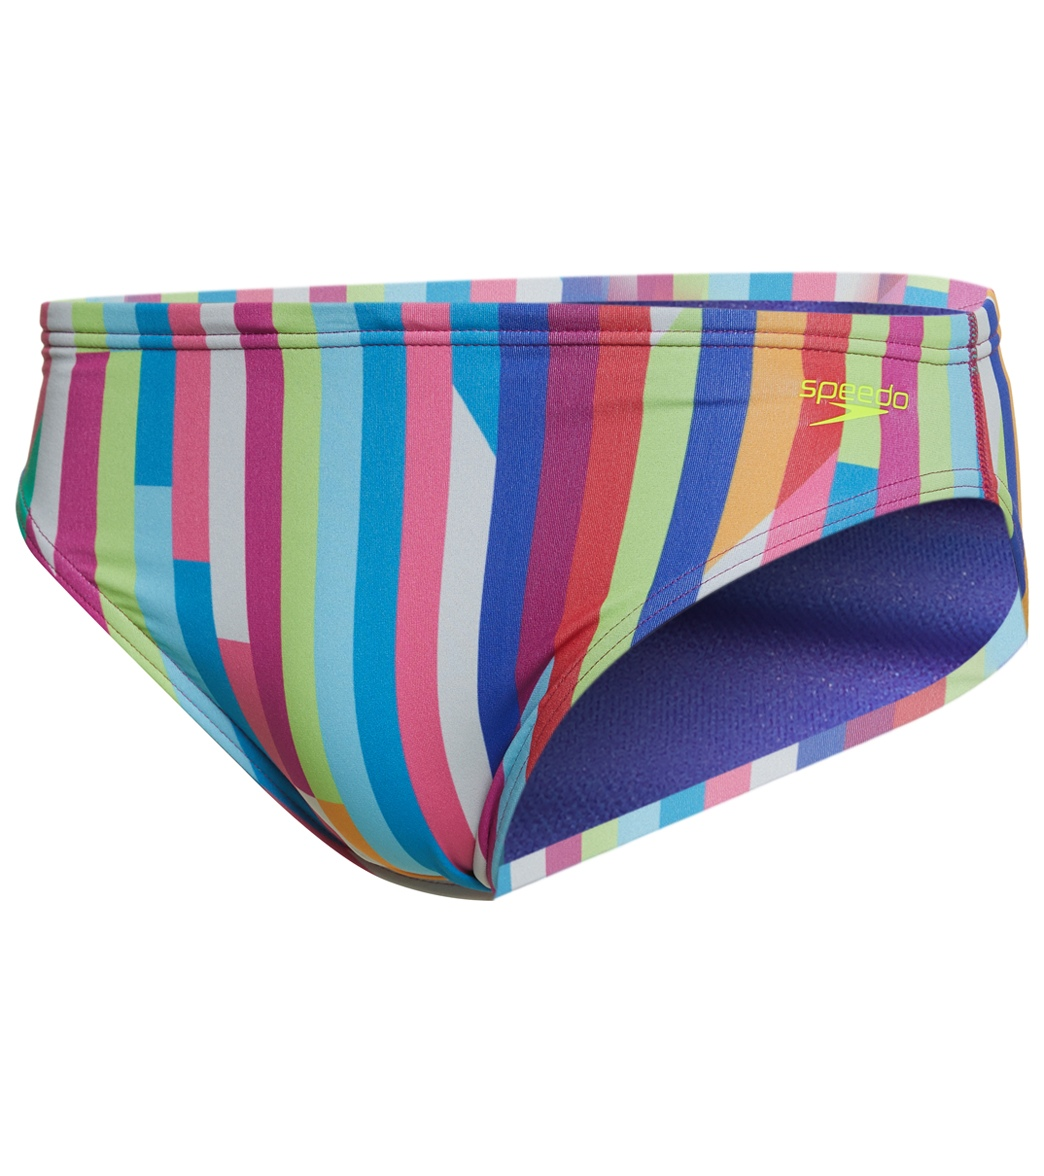 0989da18fbb28 Speedo Men's Turnz Rainbow Flash Brief Swimsuit at SwimOutlet.com